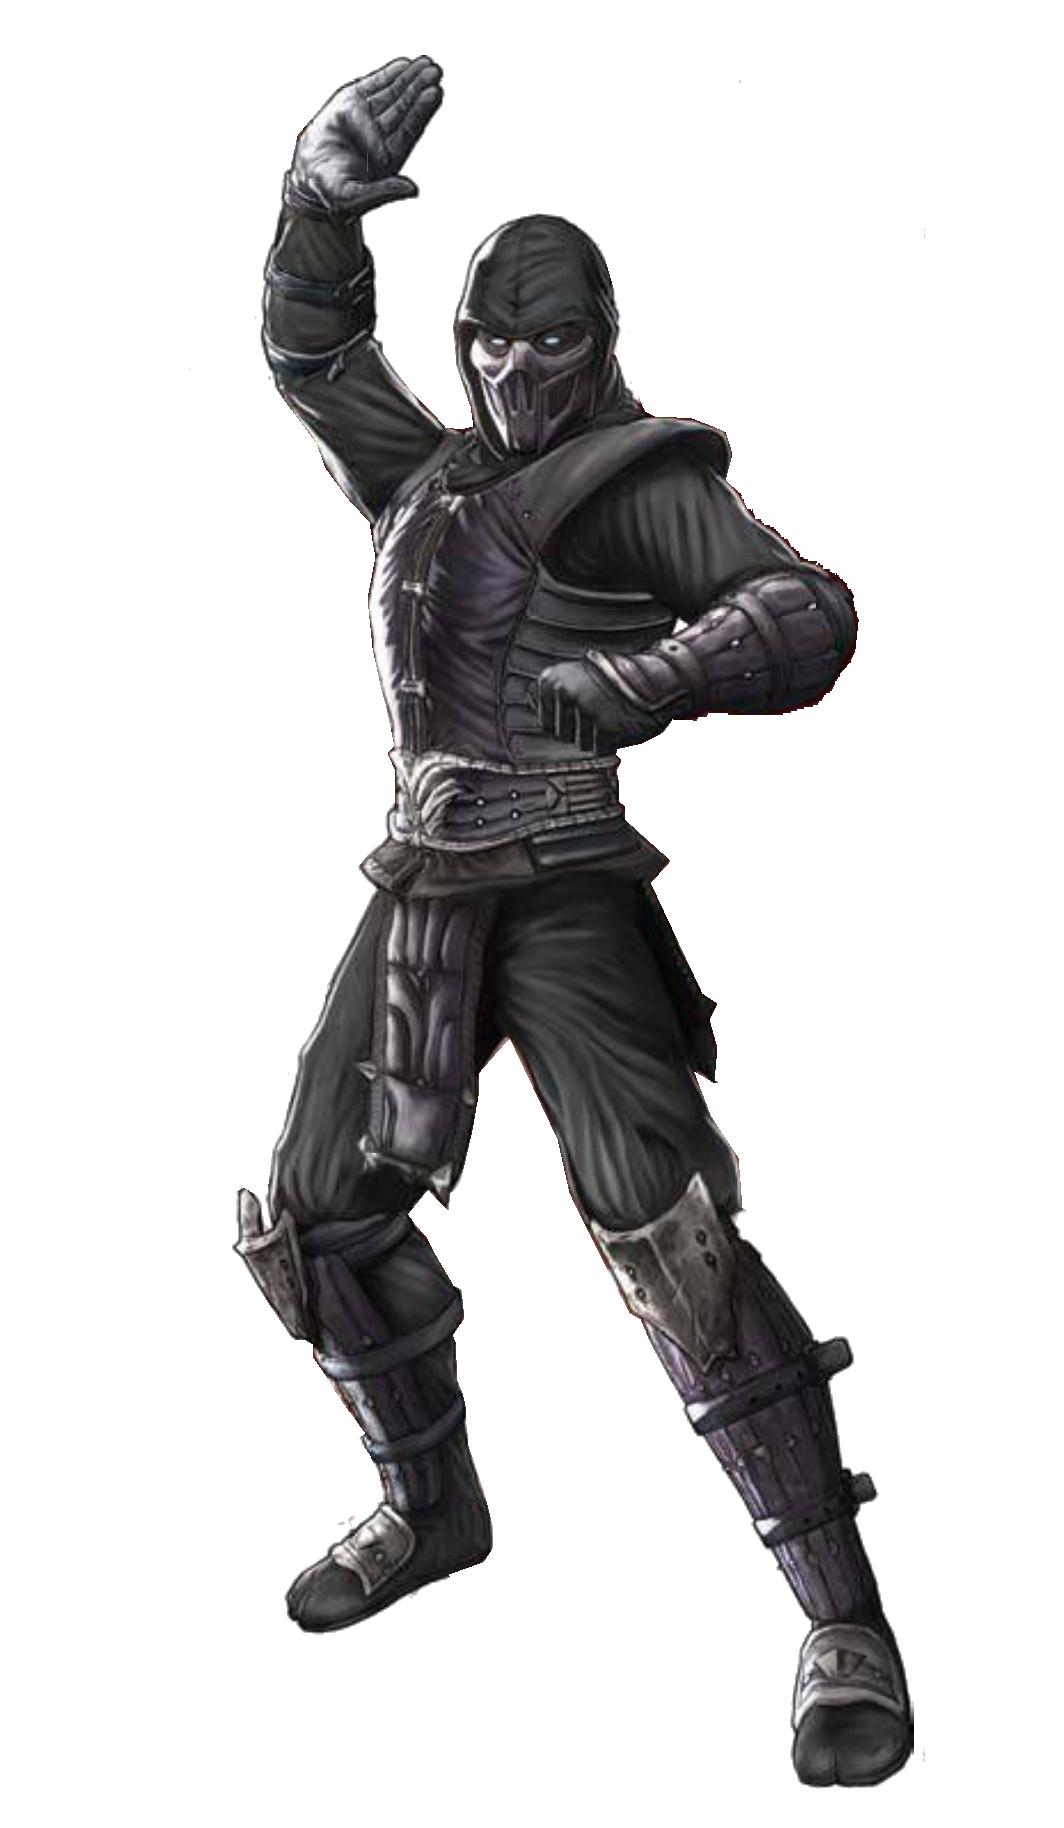 noob-saibot-mitico-Ninja-amico-dei-Noob-…il-caro-Noob-Saibot-di-Mortal-Kombat-wallpaper-wp427993